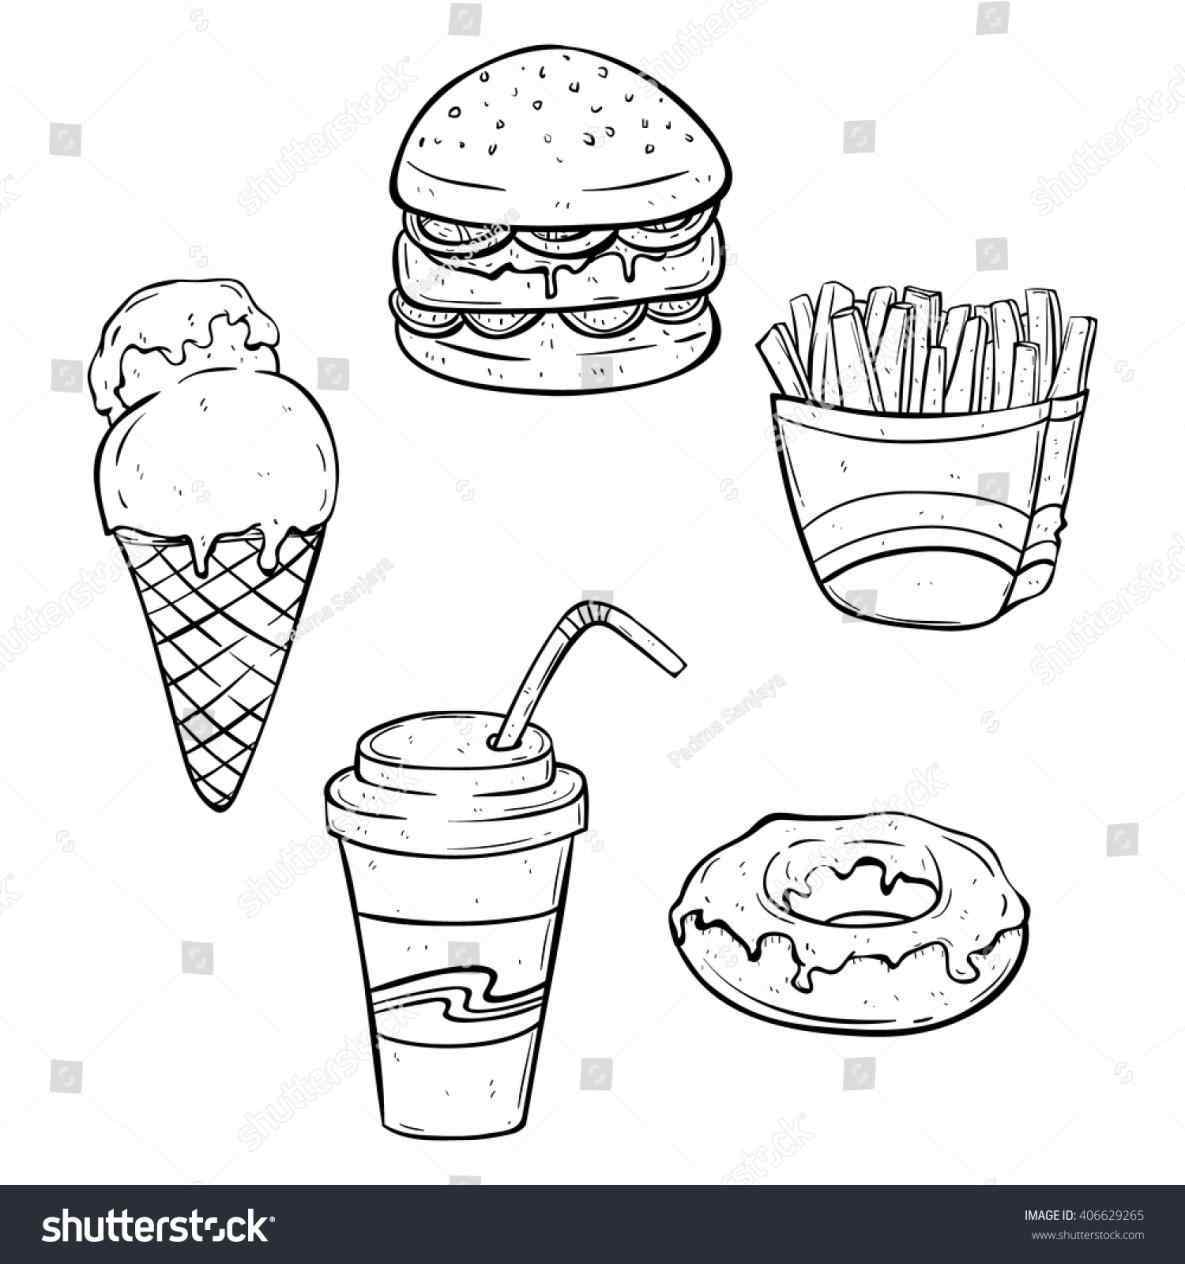 1185x1264 Unhealthy Food Drawing 2018